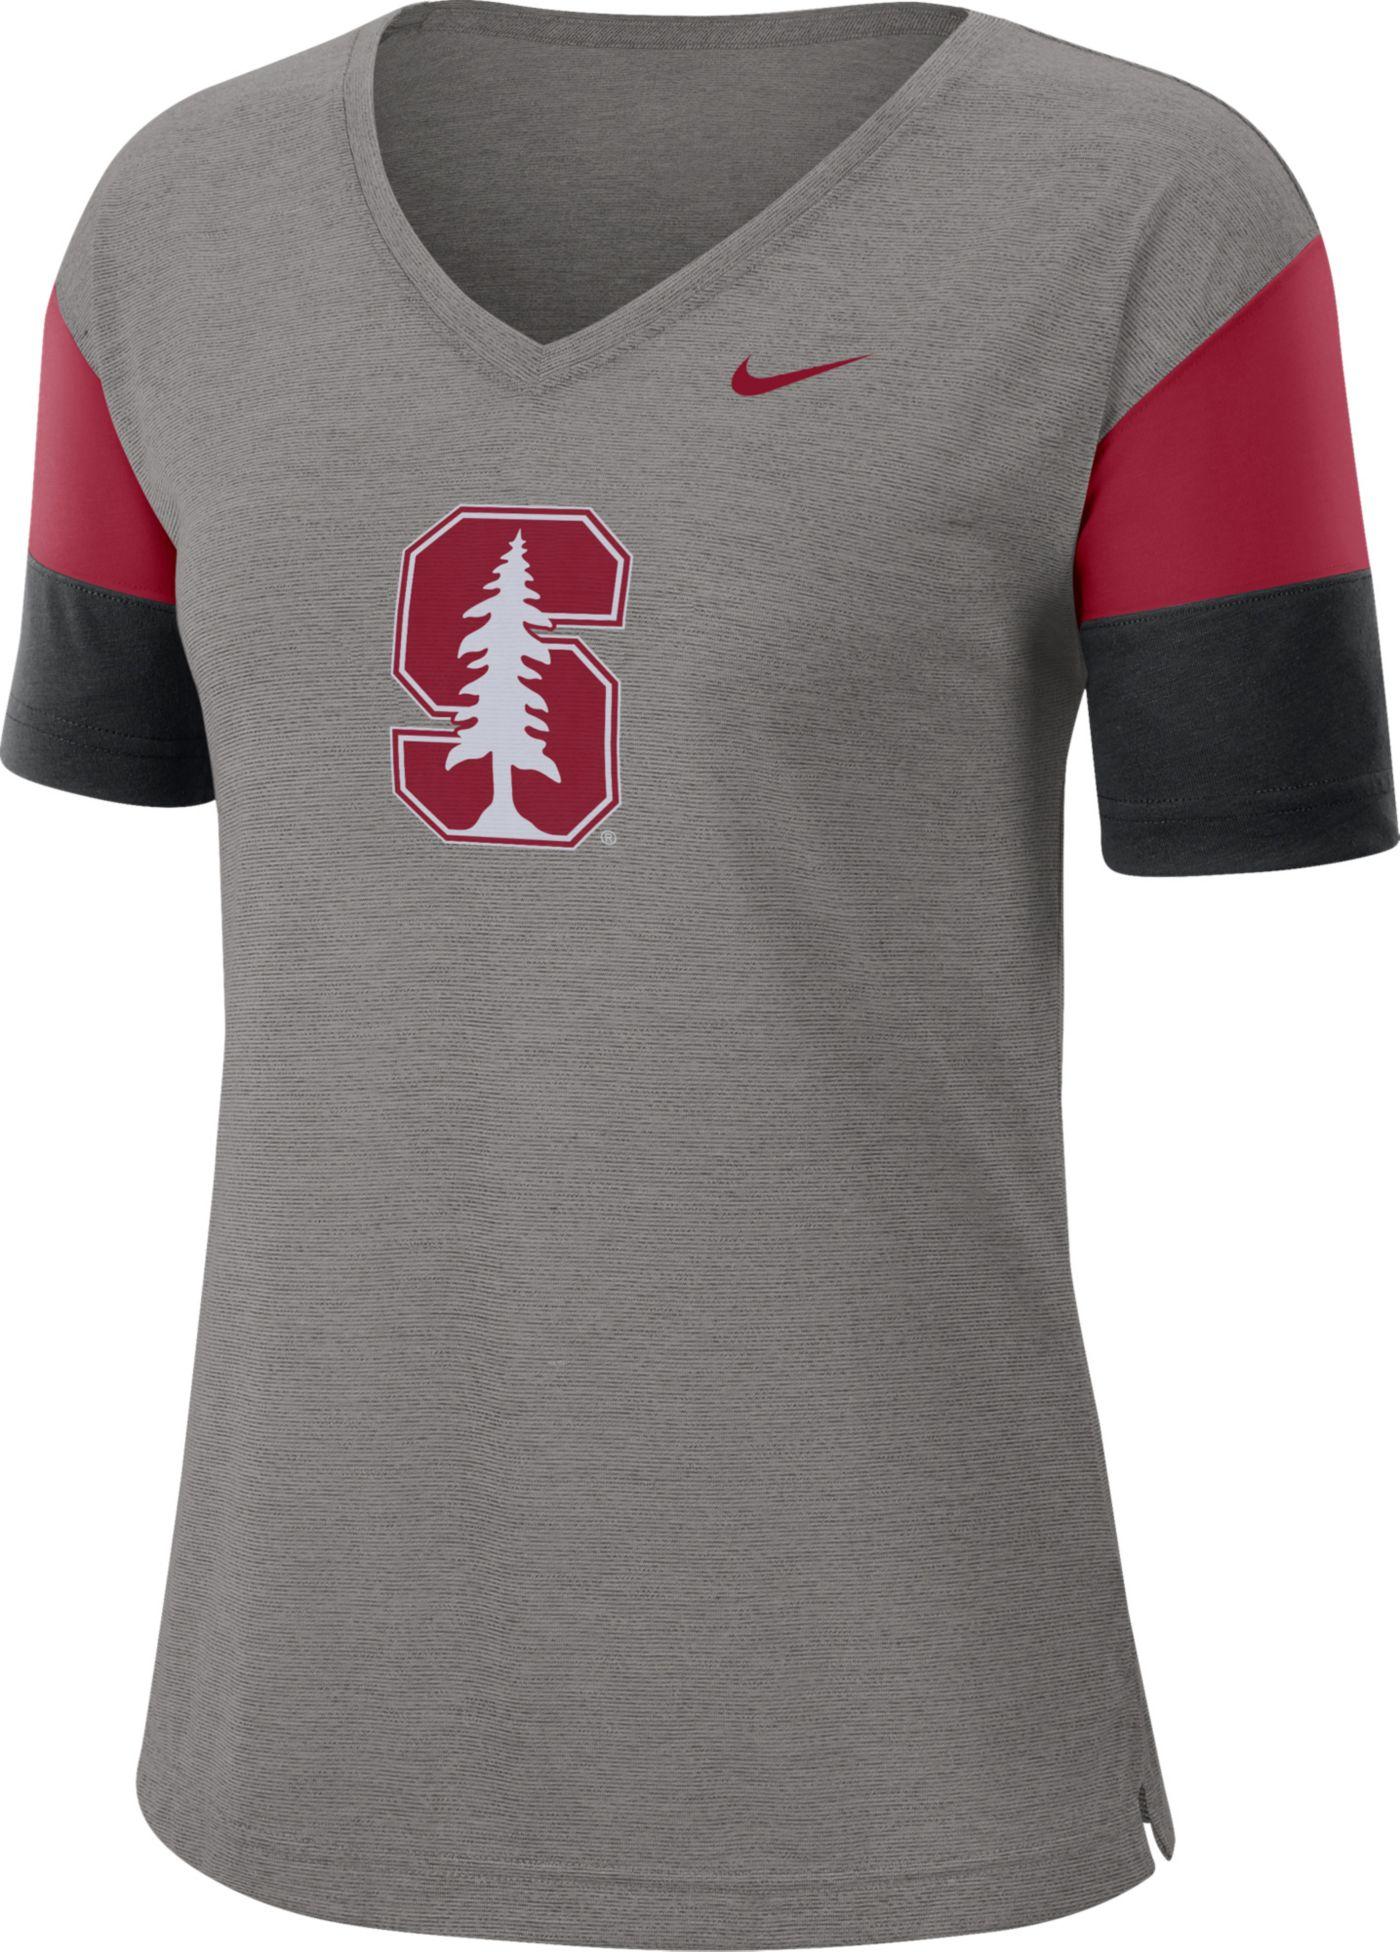 Nike Women's Stanford Cardinal Grey Breathe V-Neck T-Shirt